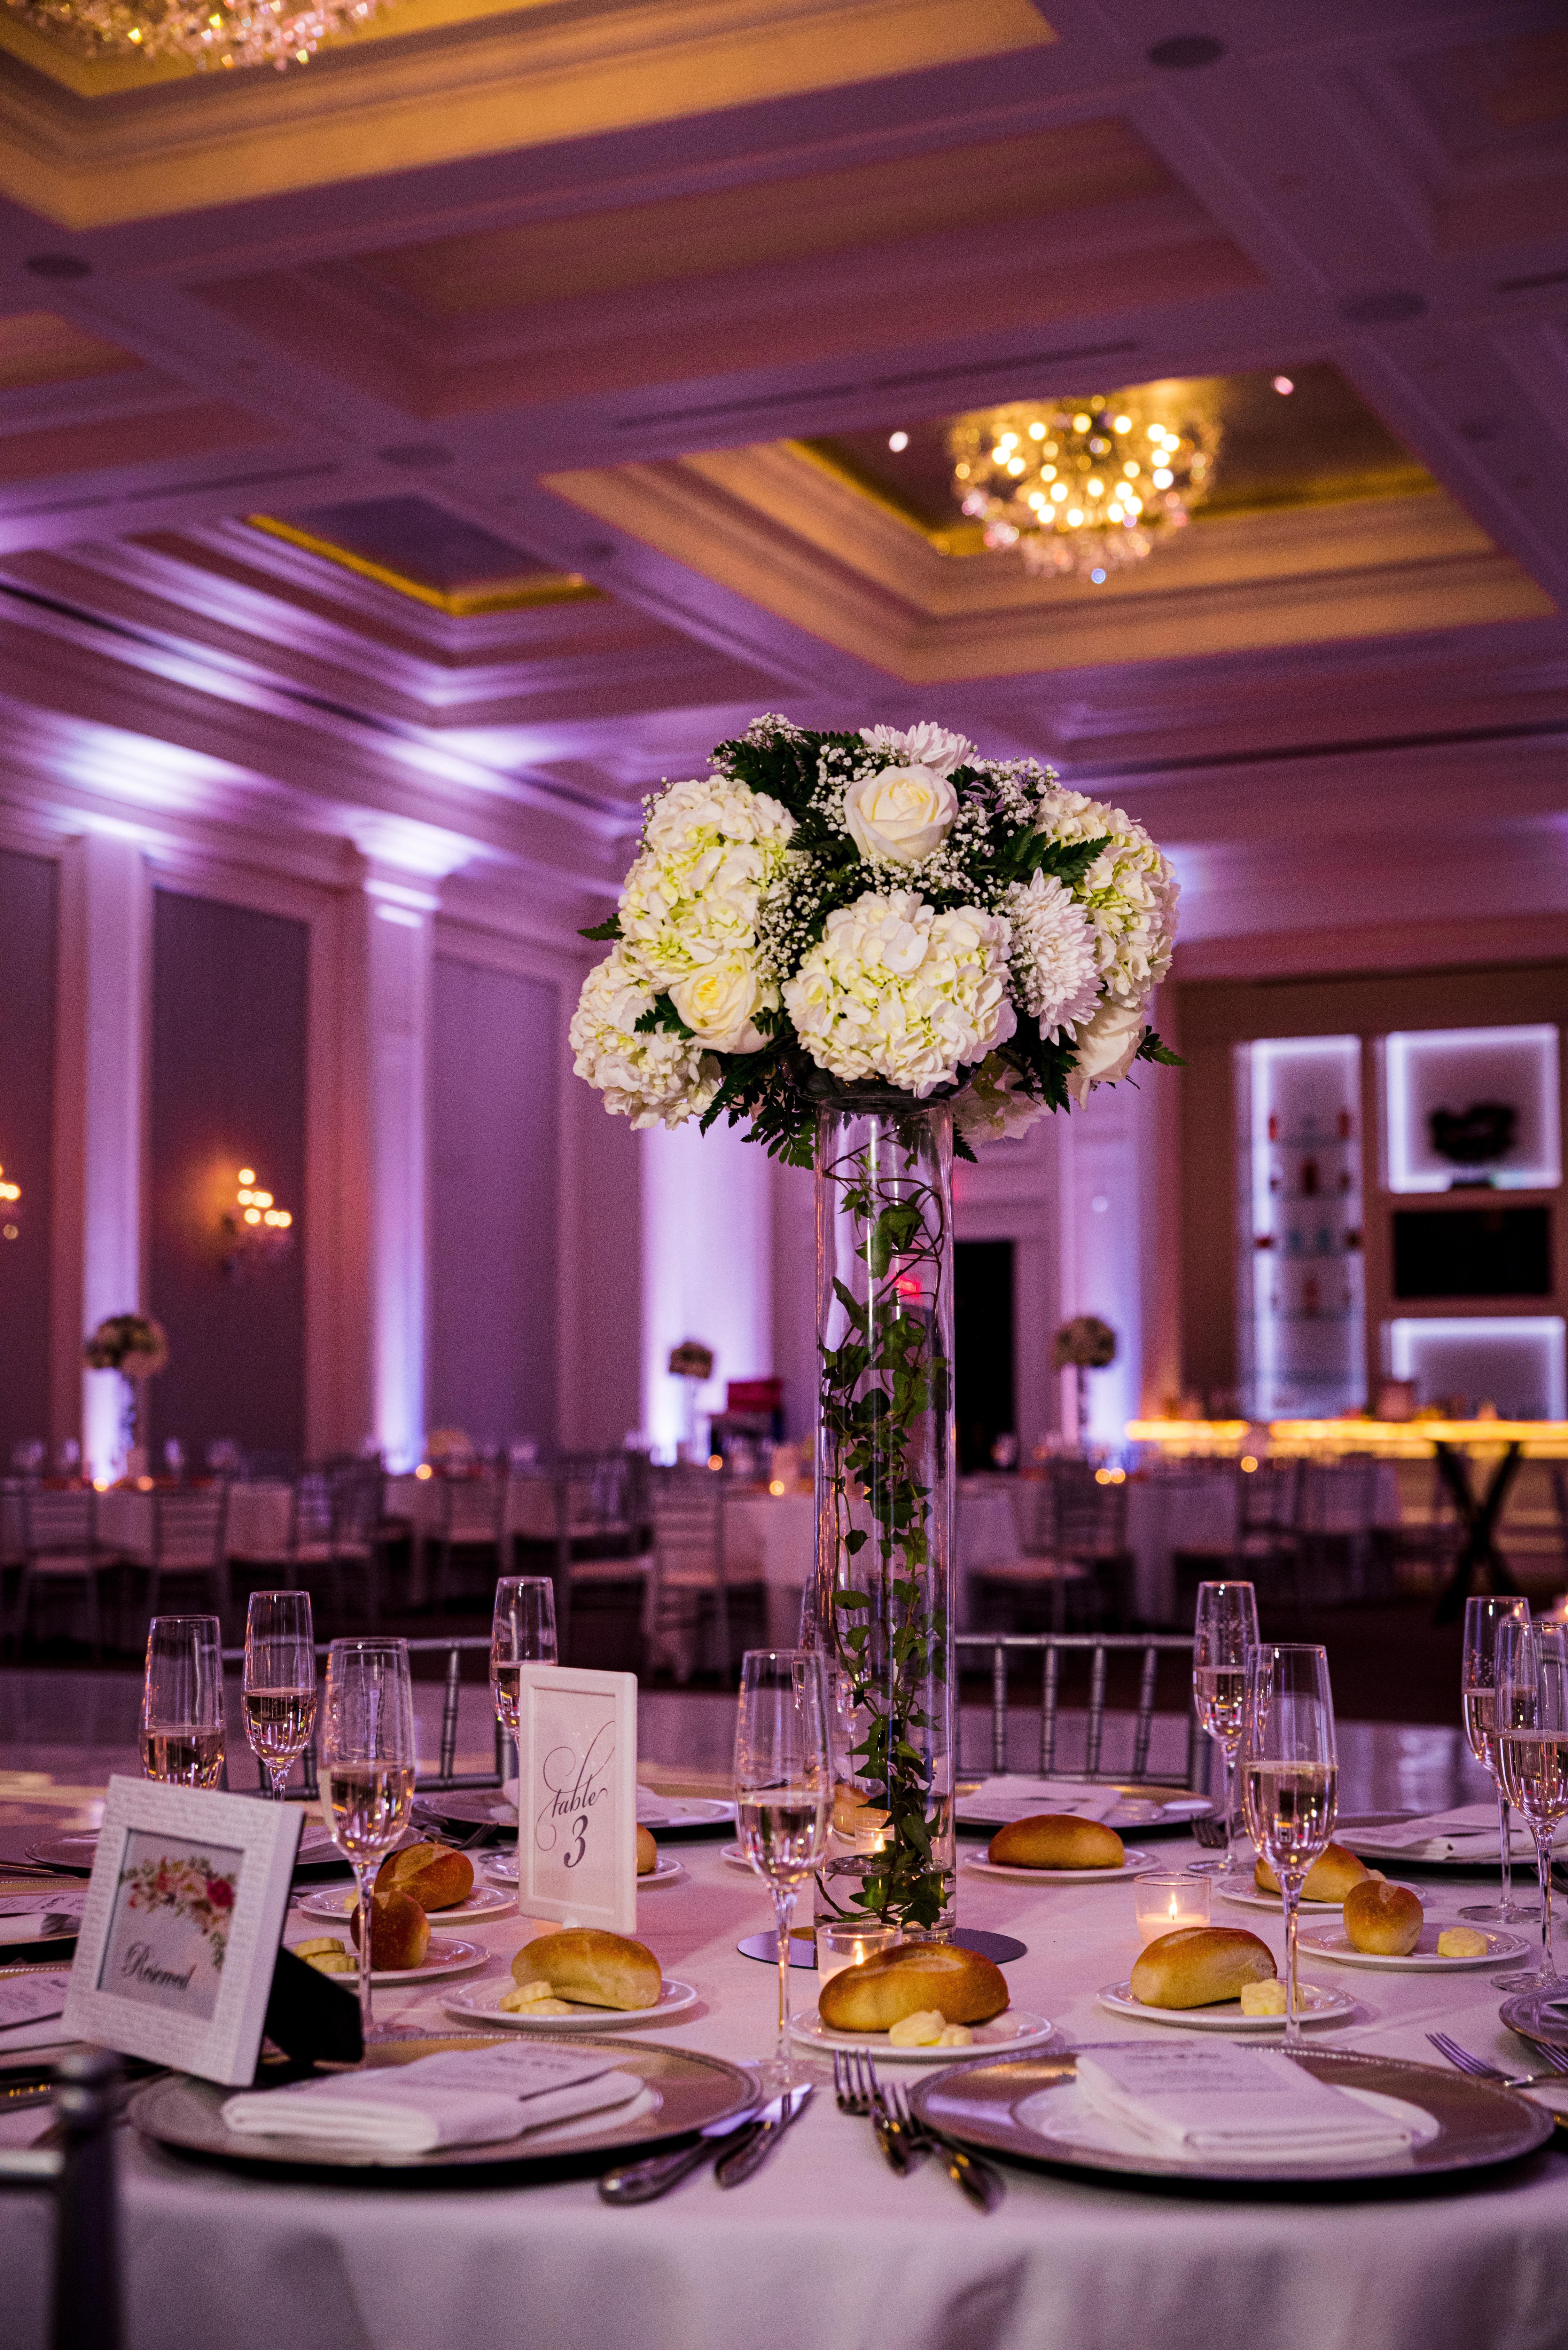 Wedding Flower Table Decor The Ballroom at Ellis